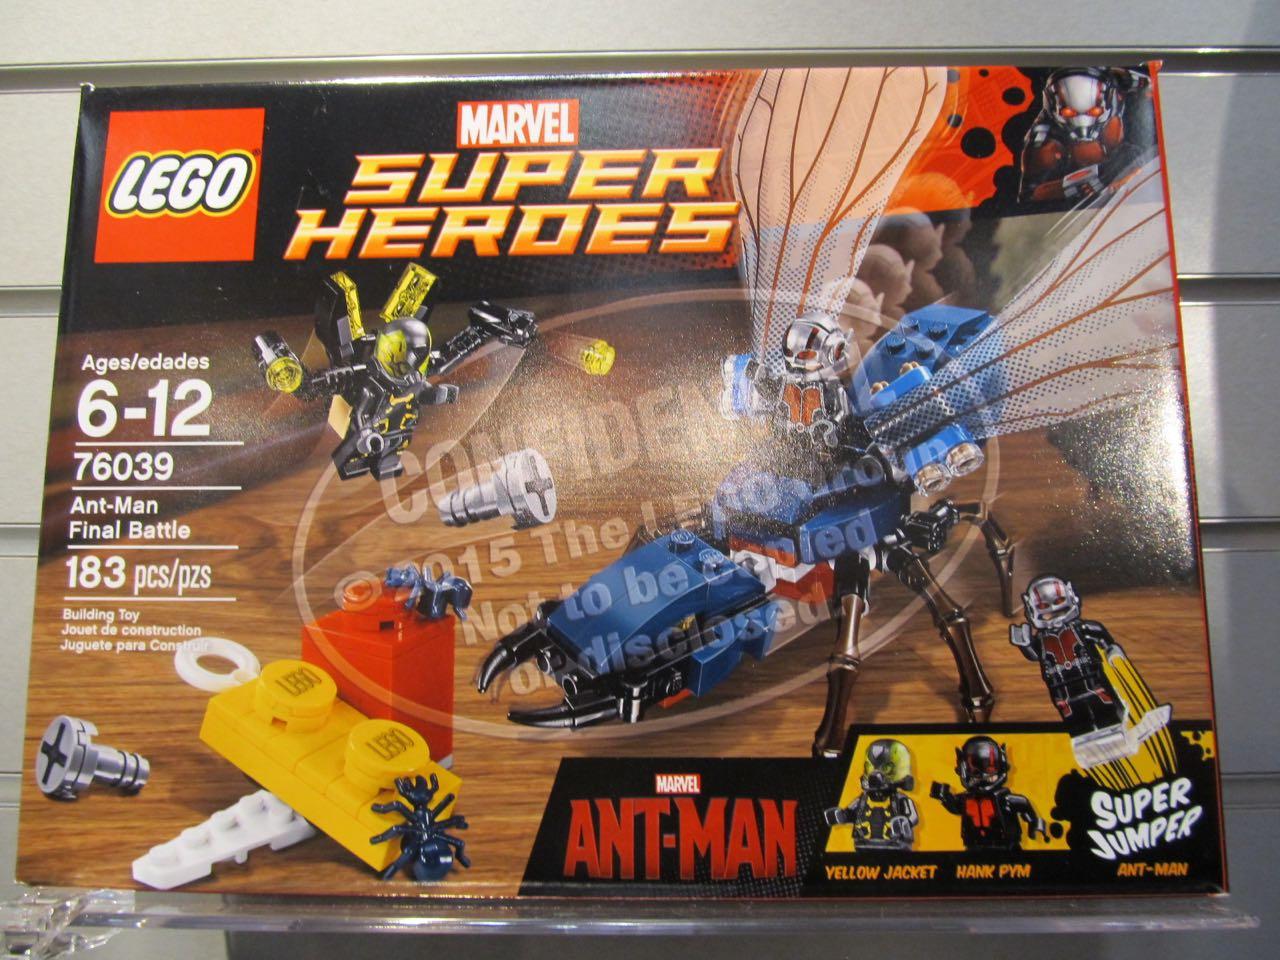 Toy Fair 2015: Ant-Man Lego Set